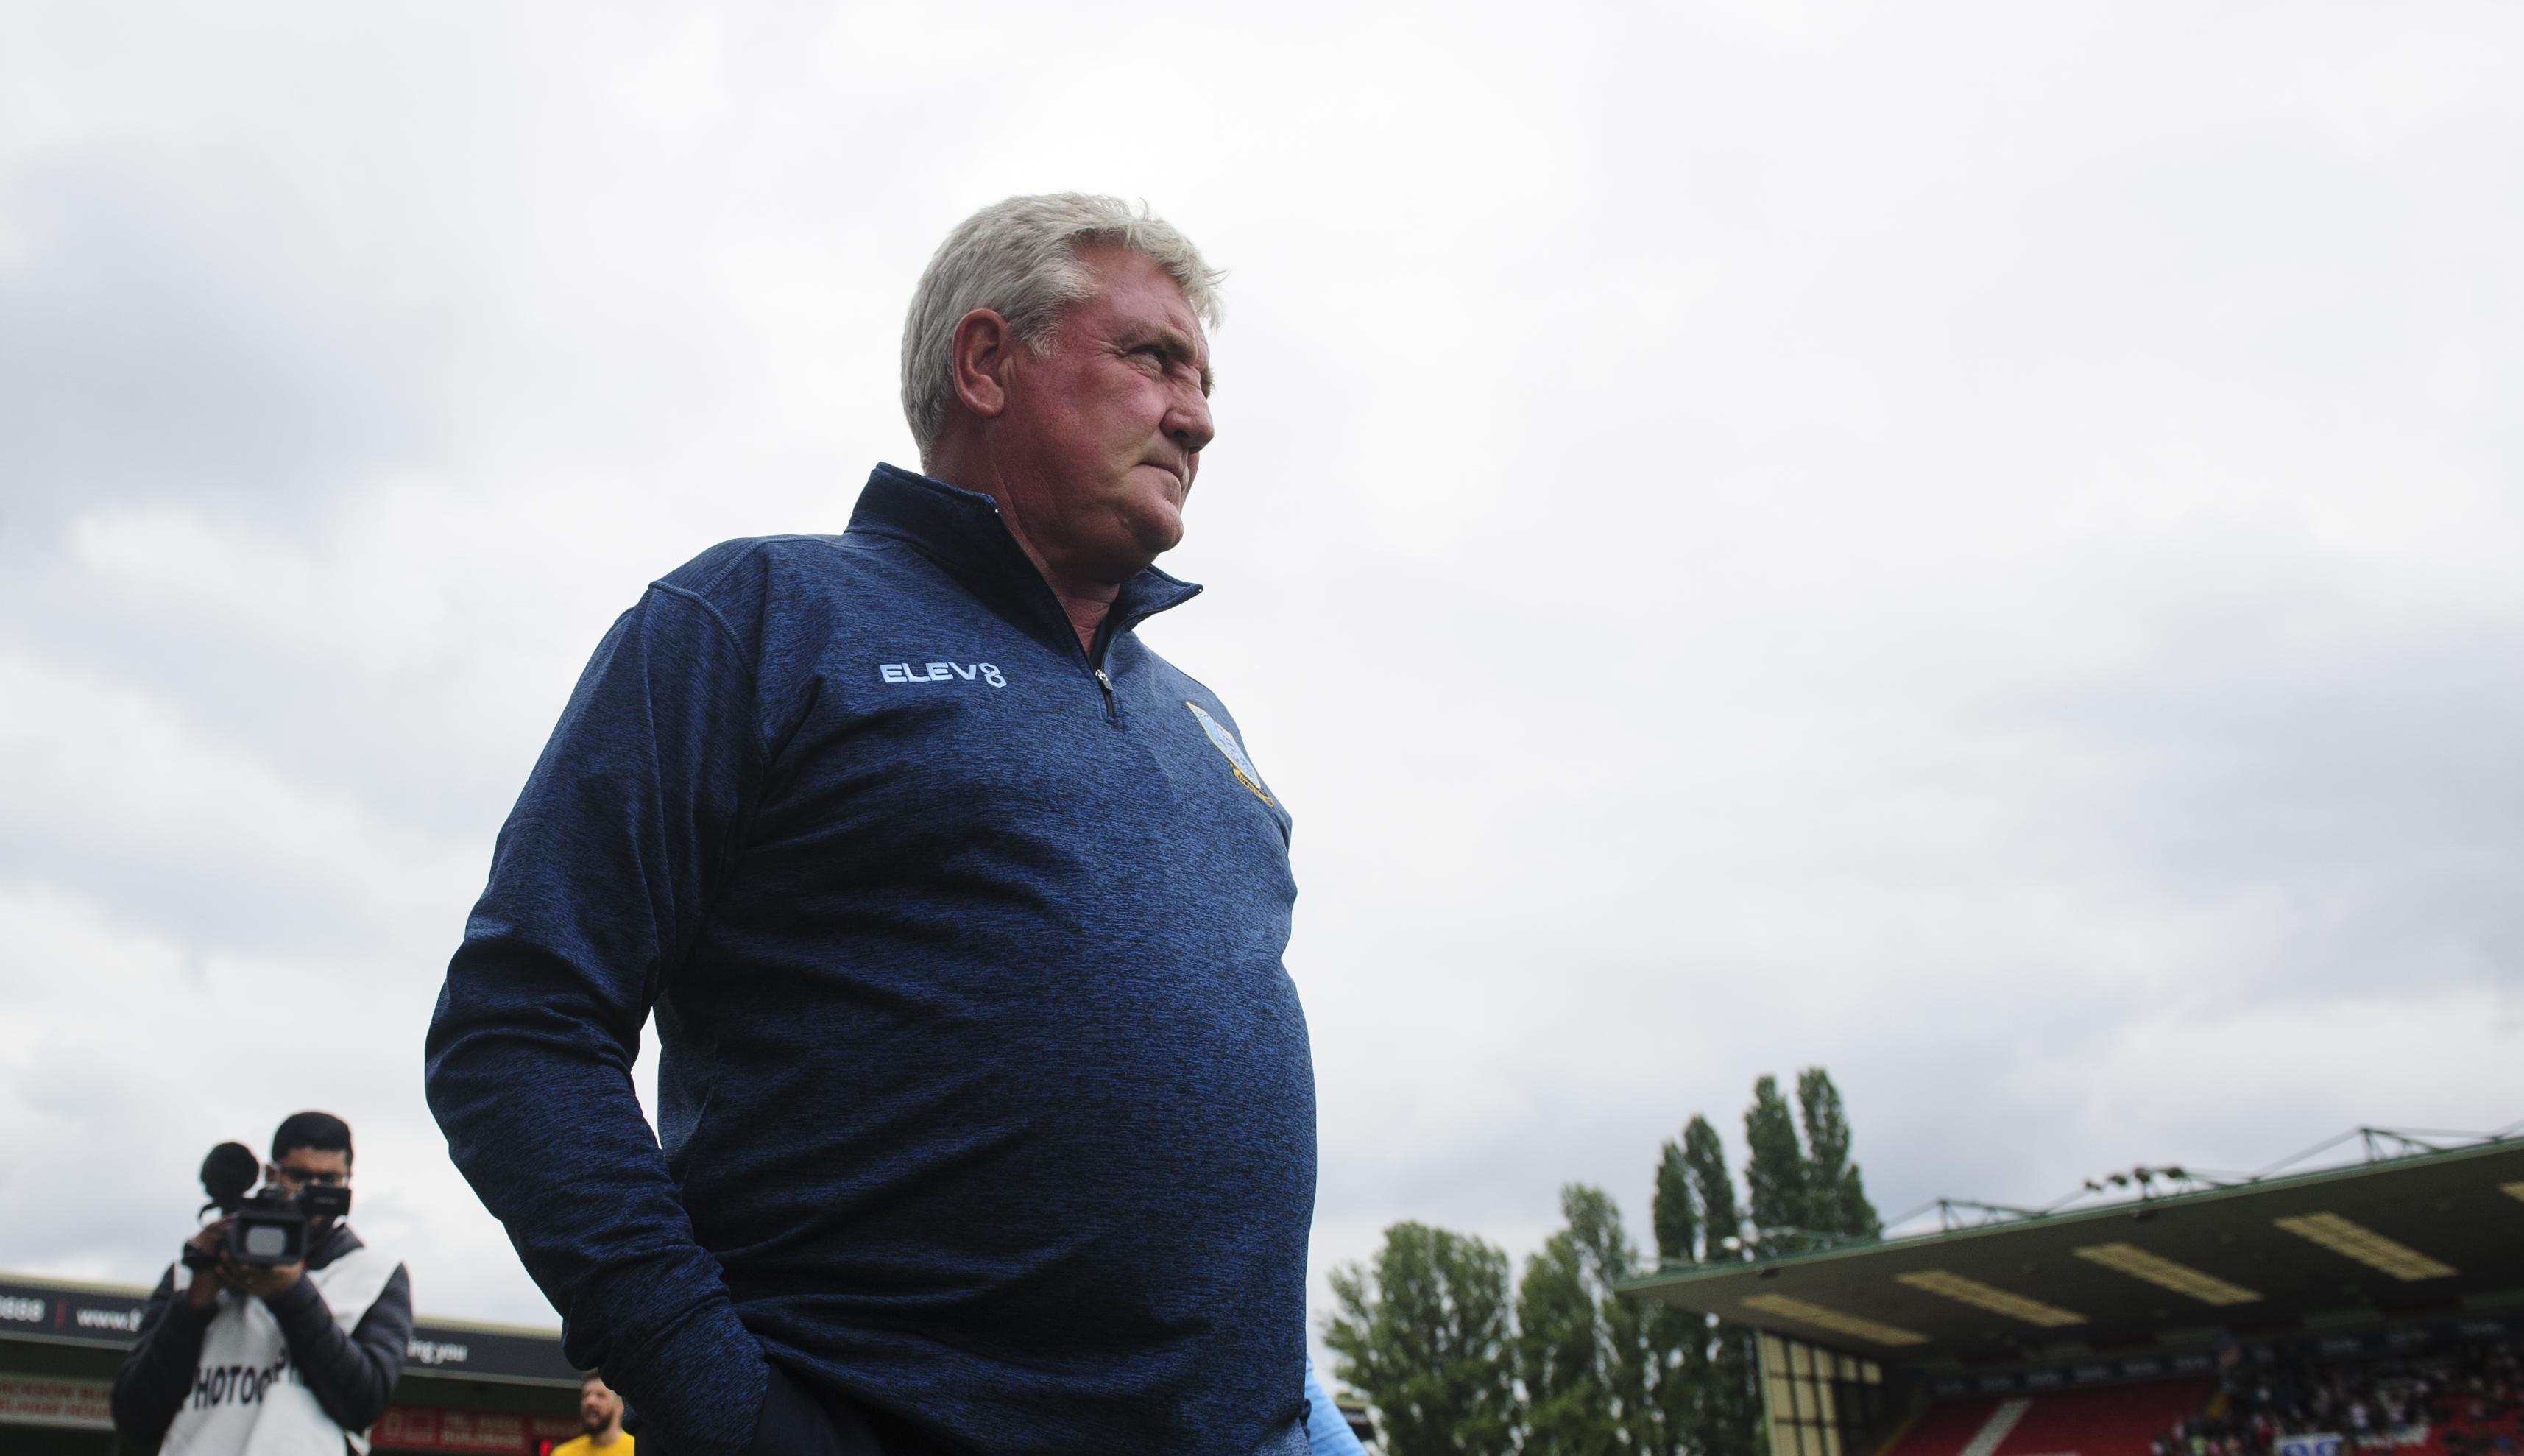 A final reflection on Steve Bruce's time at Aston Villa